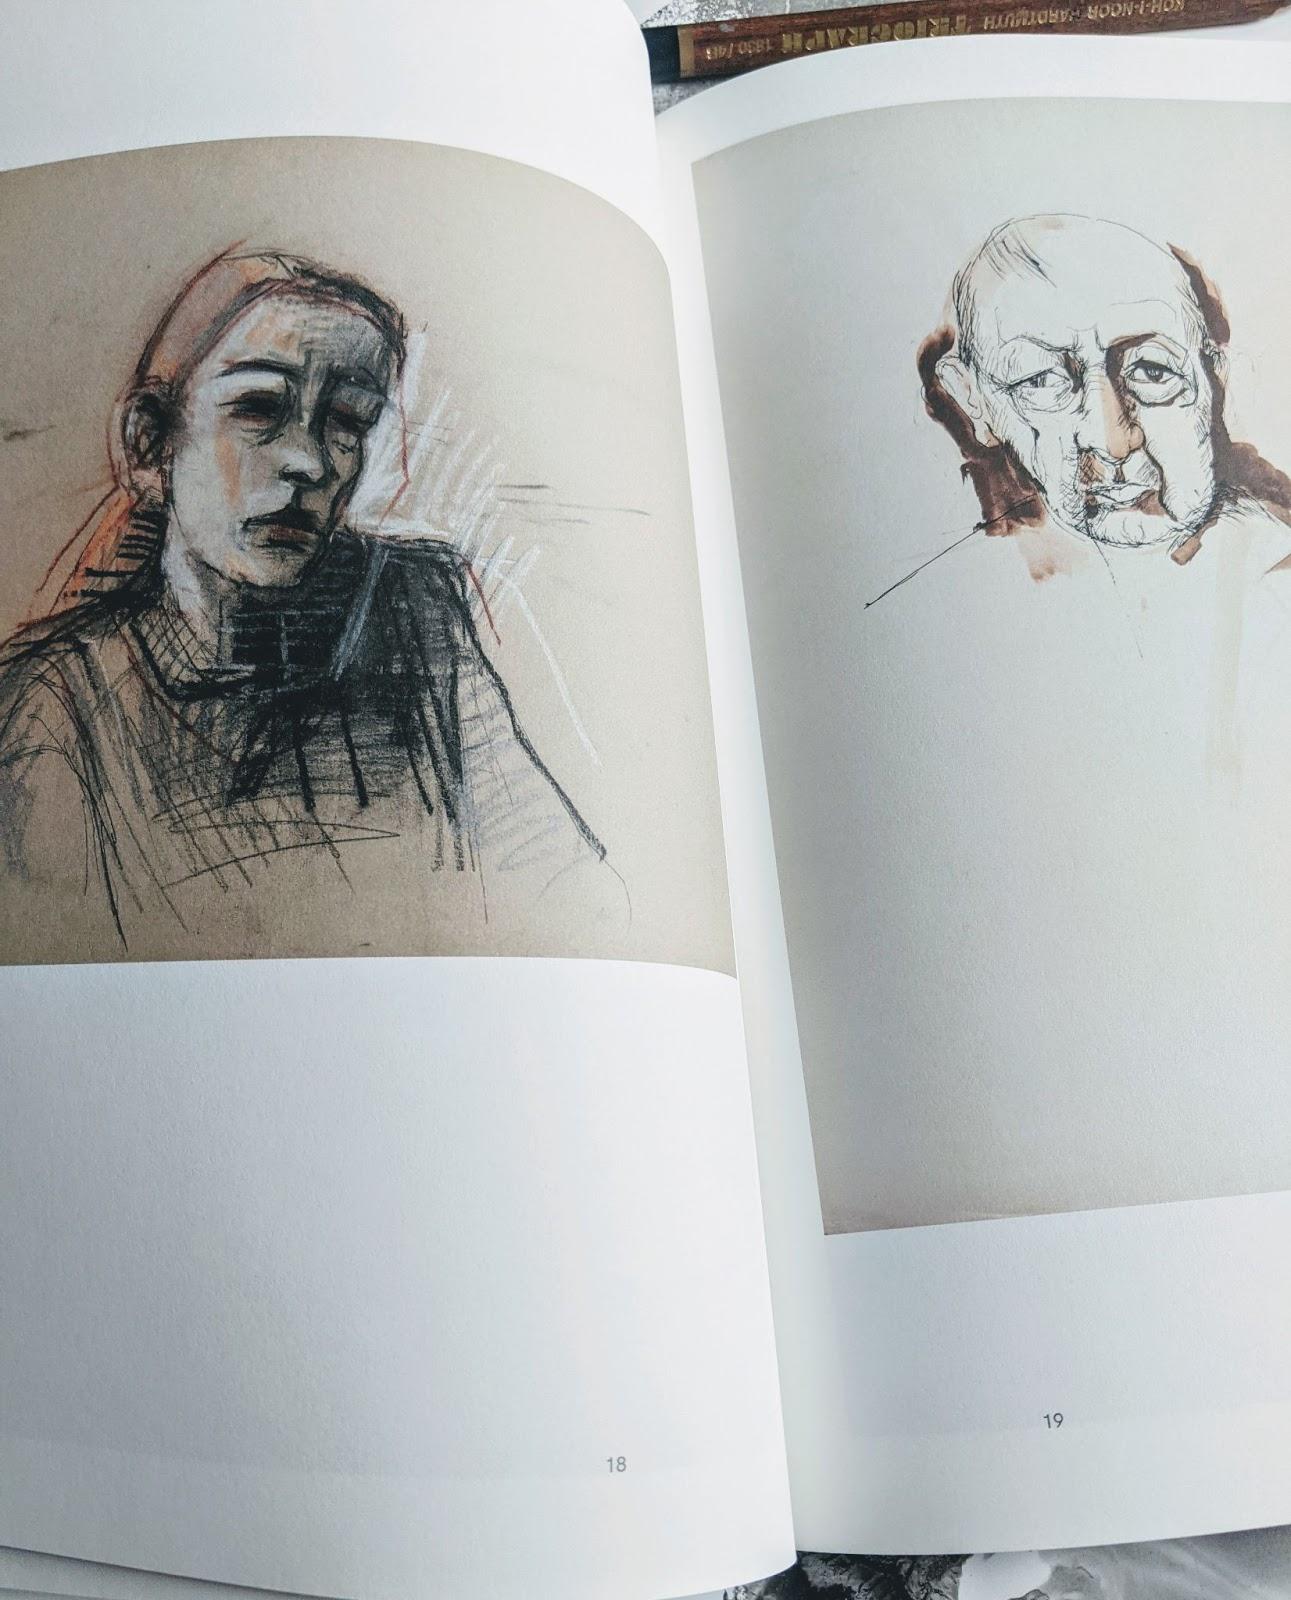 Katalog Bärbel Bohley - Künstlerin / Galerie Pankow